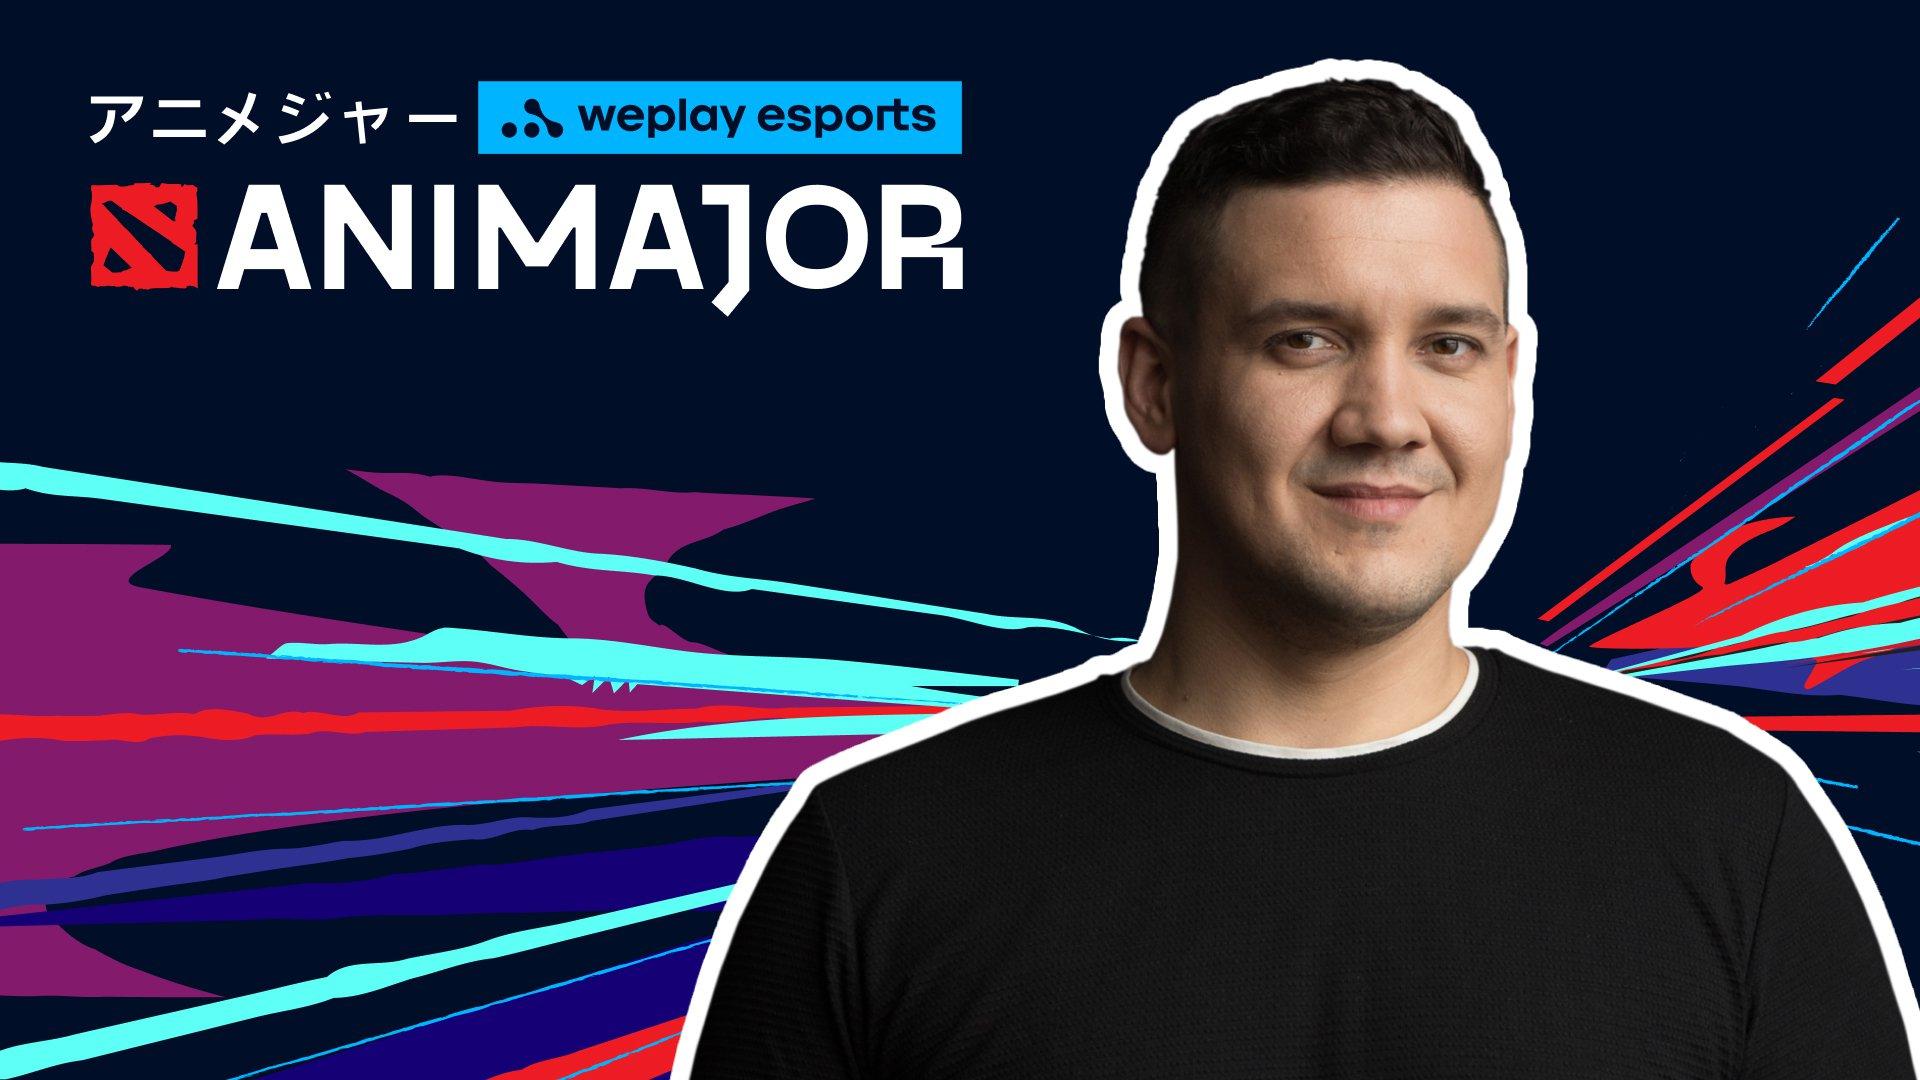 WePlay Esports首席执行官奥列格古梅纽克(Oleh Humeniuk)。 照片: WePlay Esports